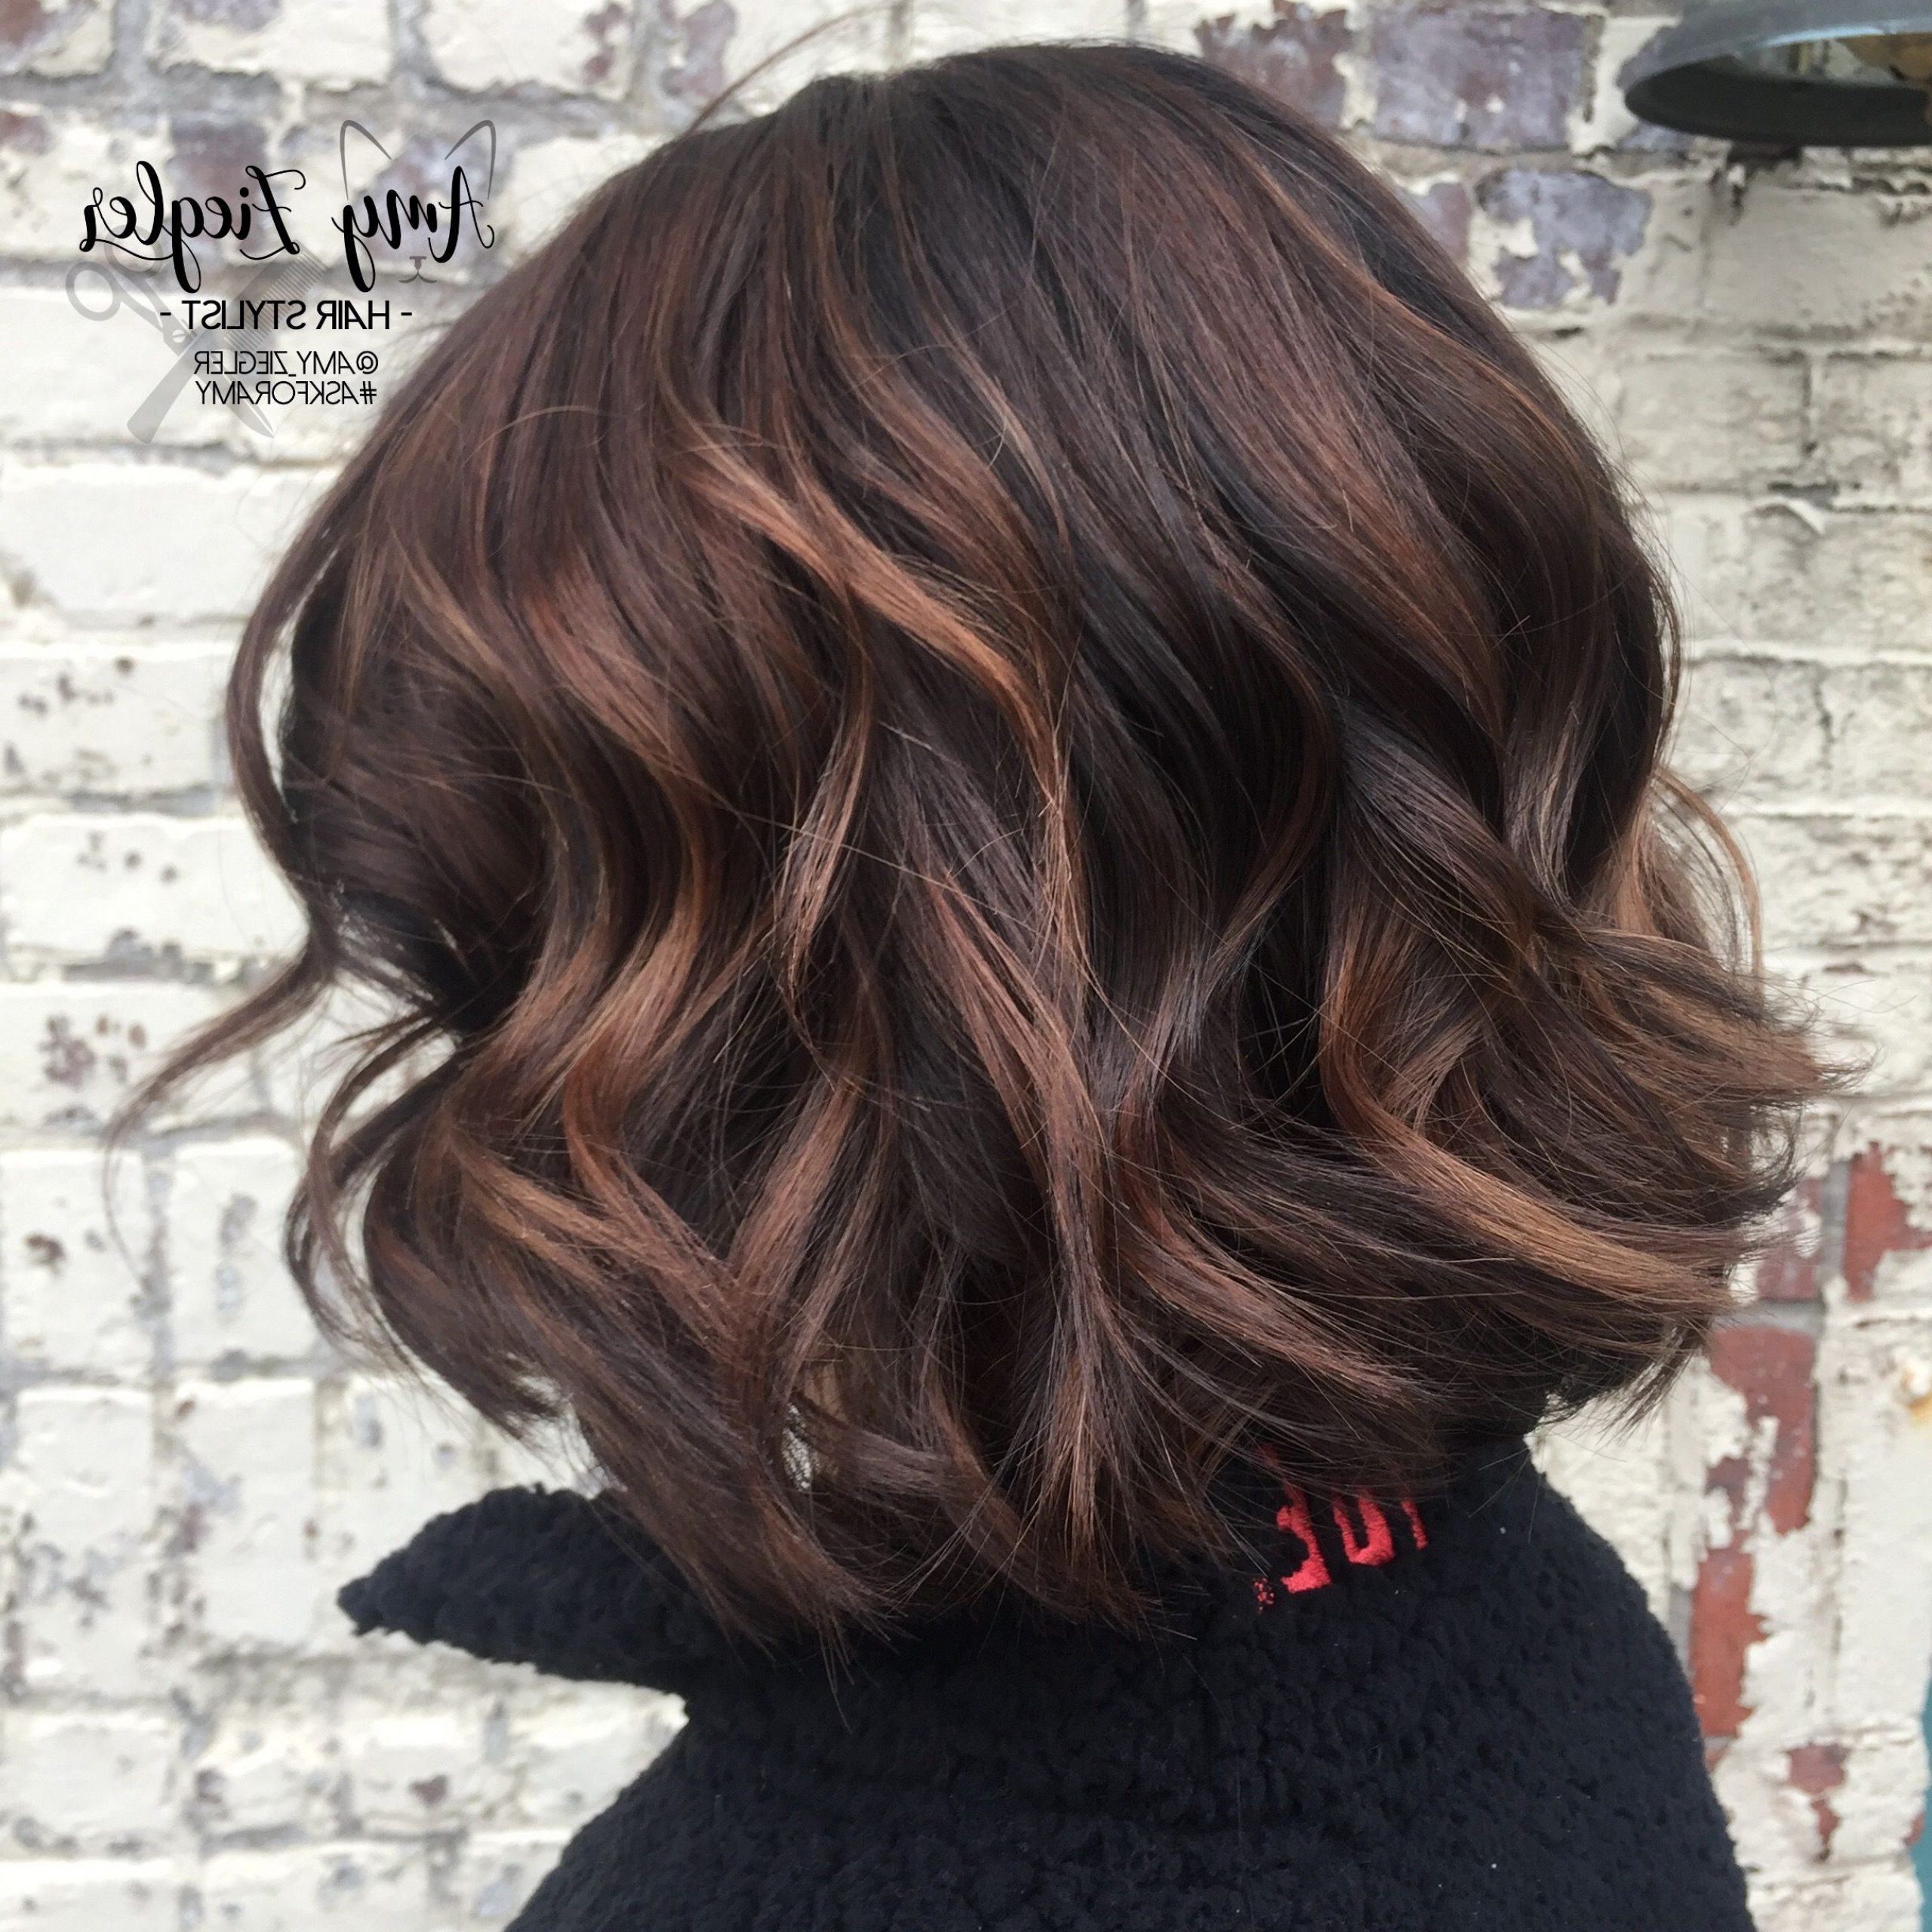 Chocolate Balayage On Short Hair@amy Ziegler # Intended For Blonde Balayage Hairstyles On Short Hair (View 3 of 20)